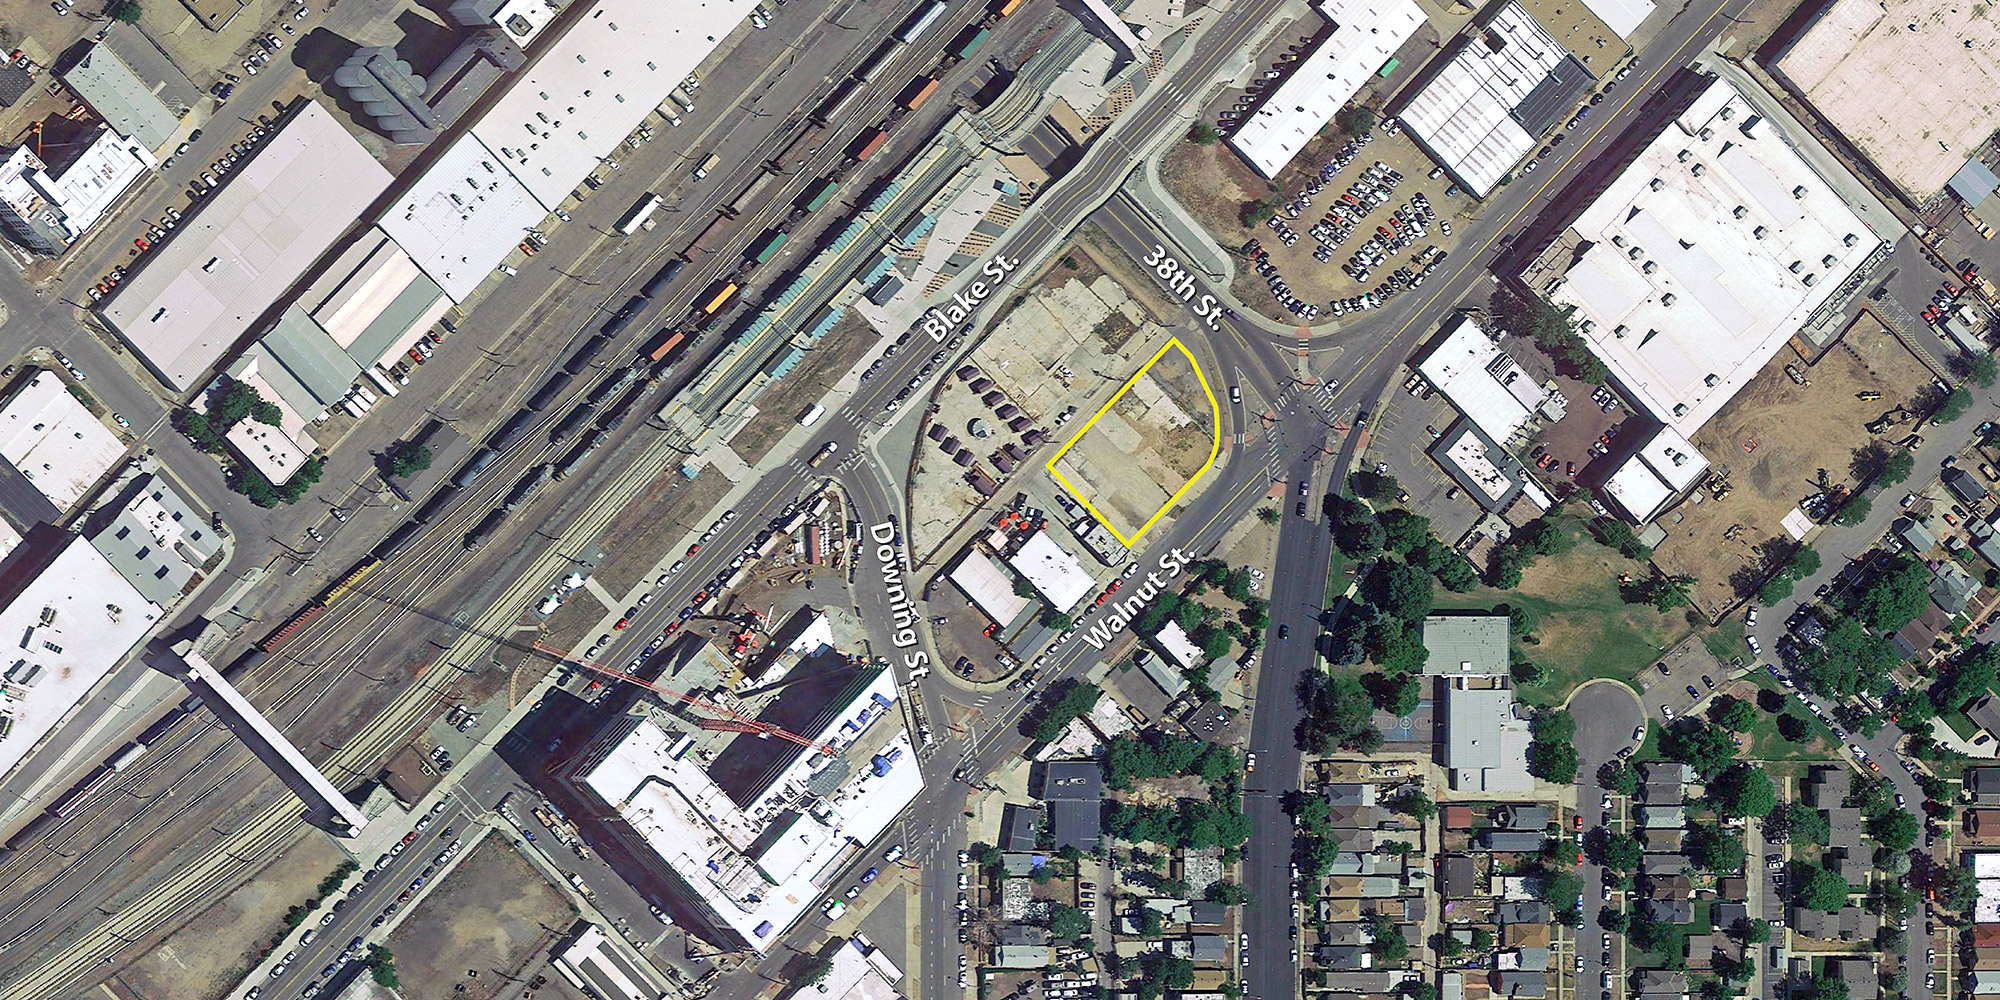 Walnut Street Lofts location, aerial base courtesy Google Earth